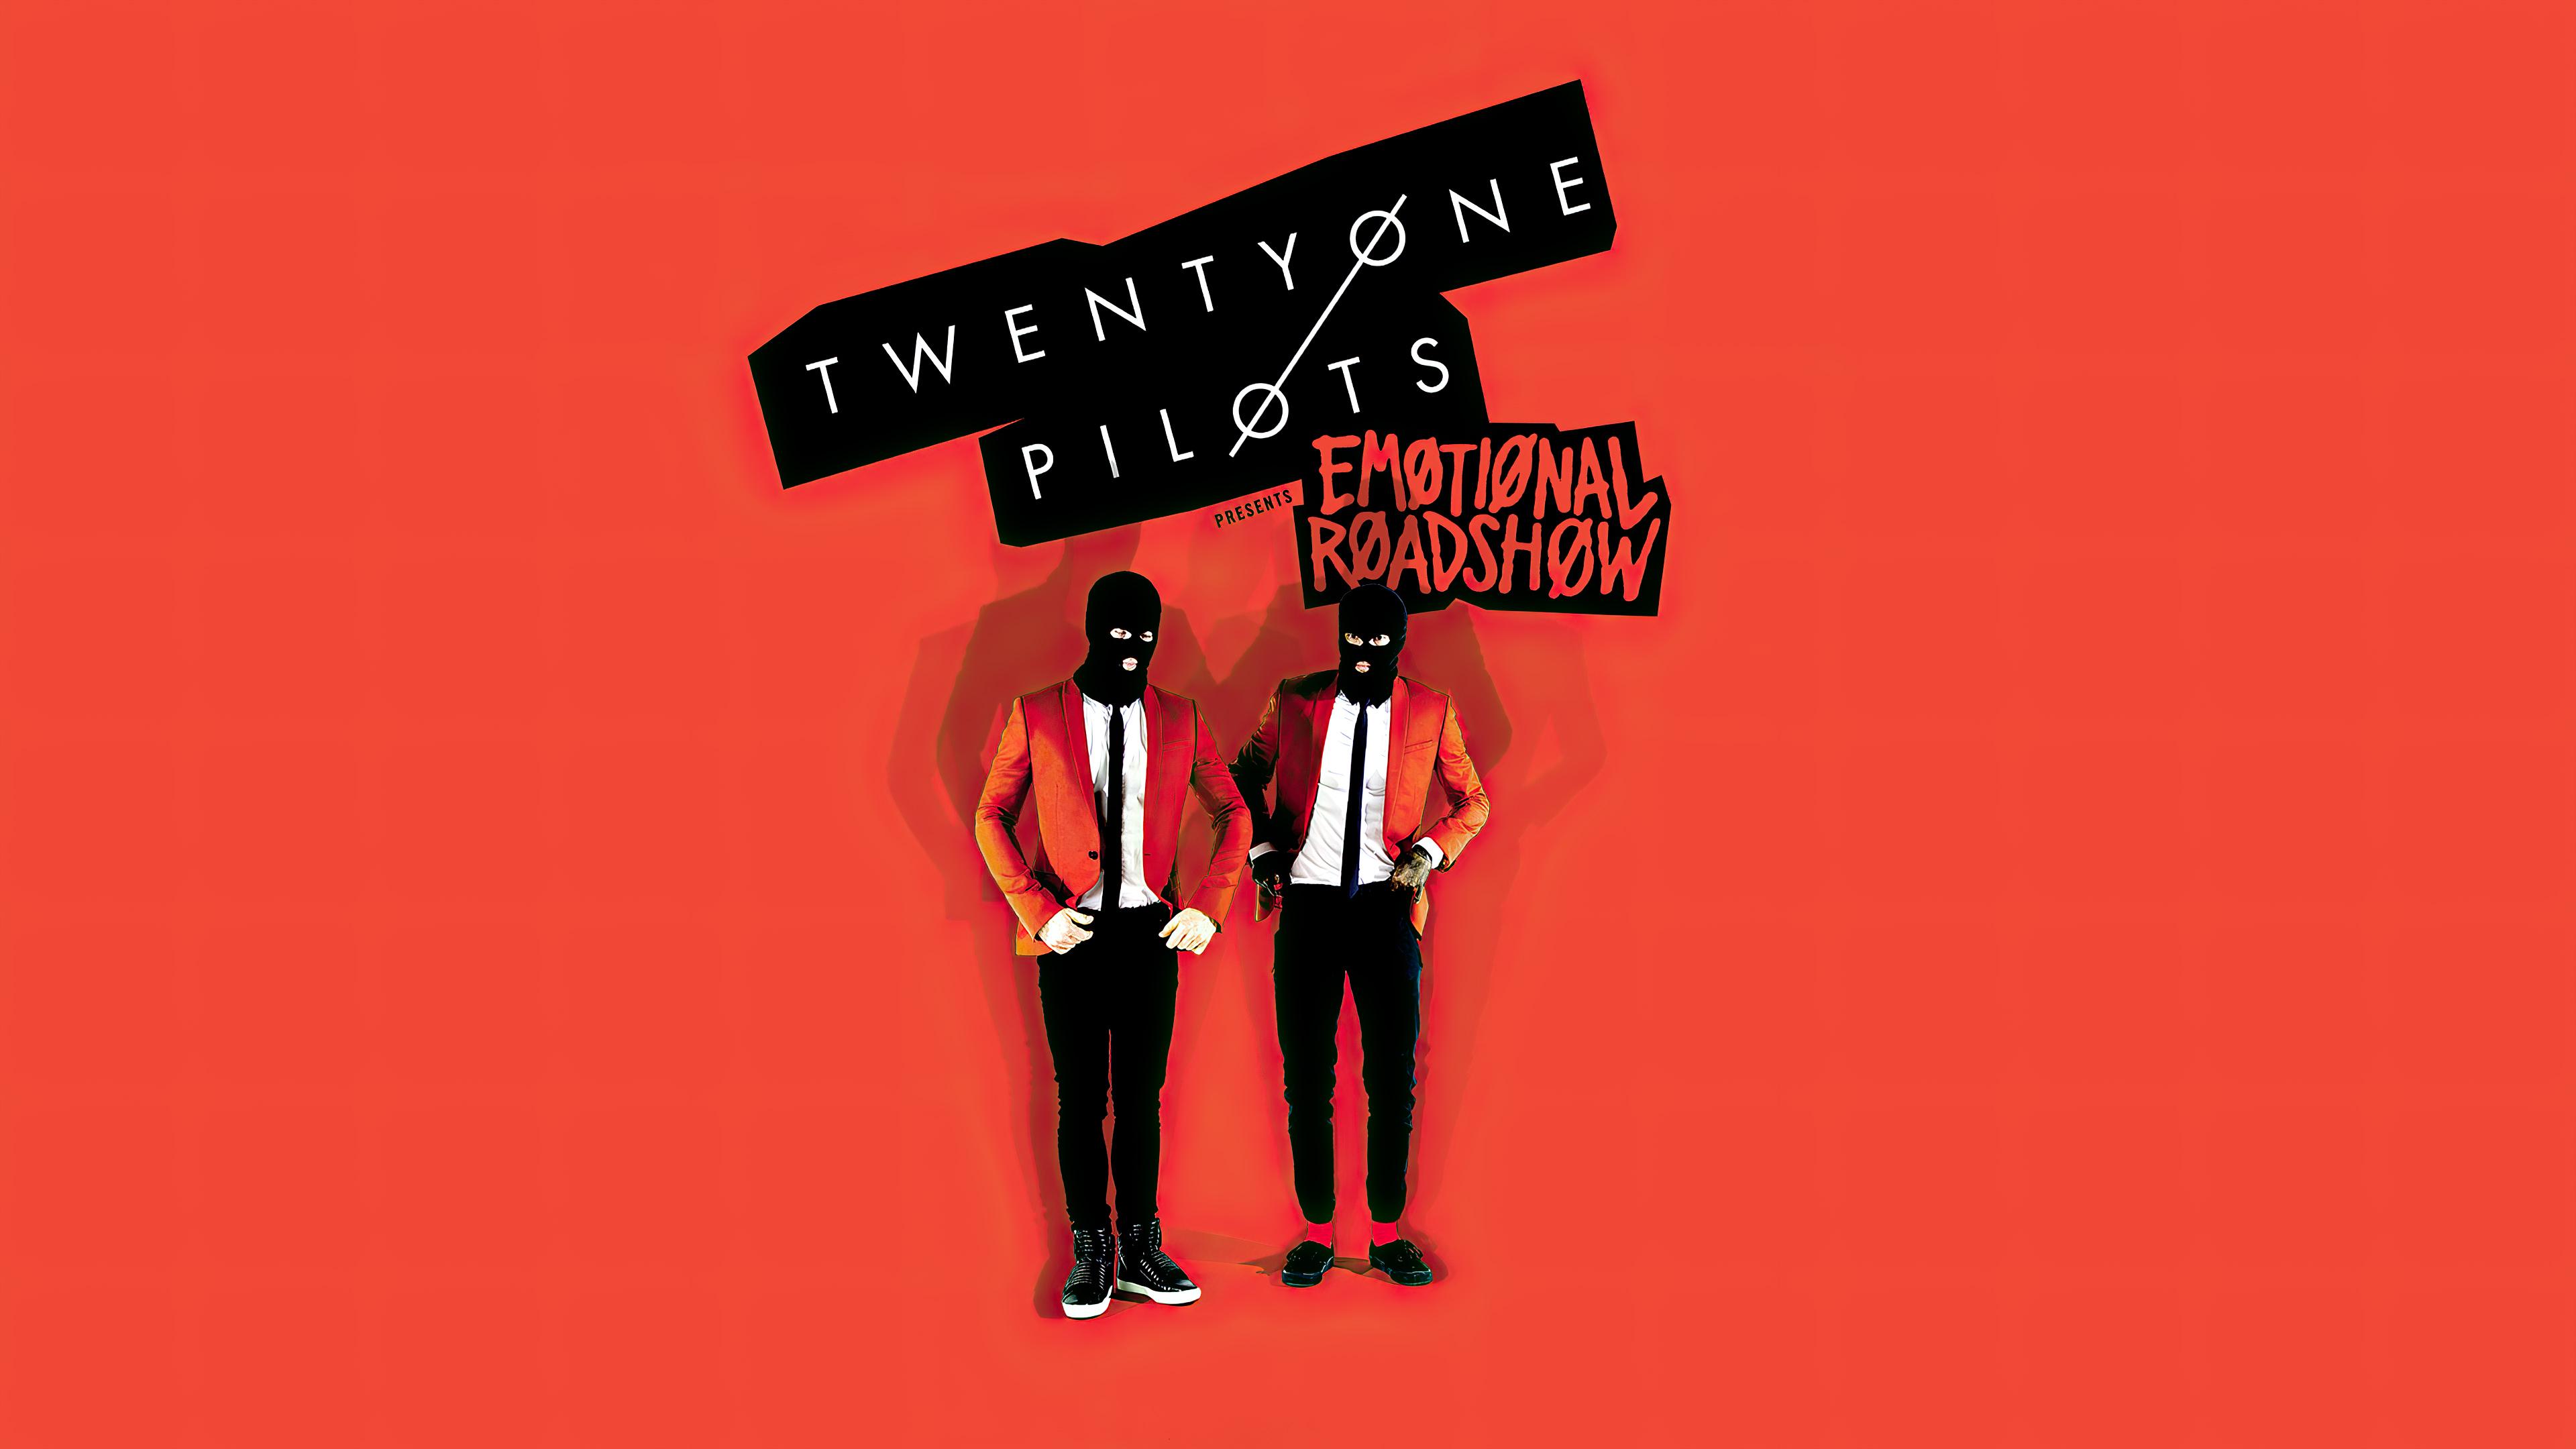 twenty one pilots 4k 1608984302 - Twenty One Pilots 4k - Twenty One Pilots 4k wallpapers